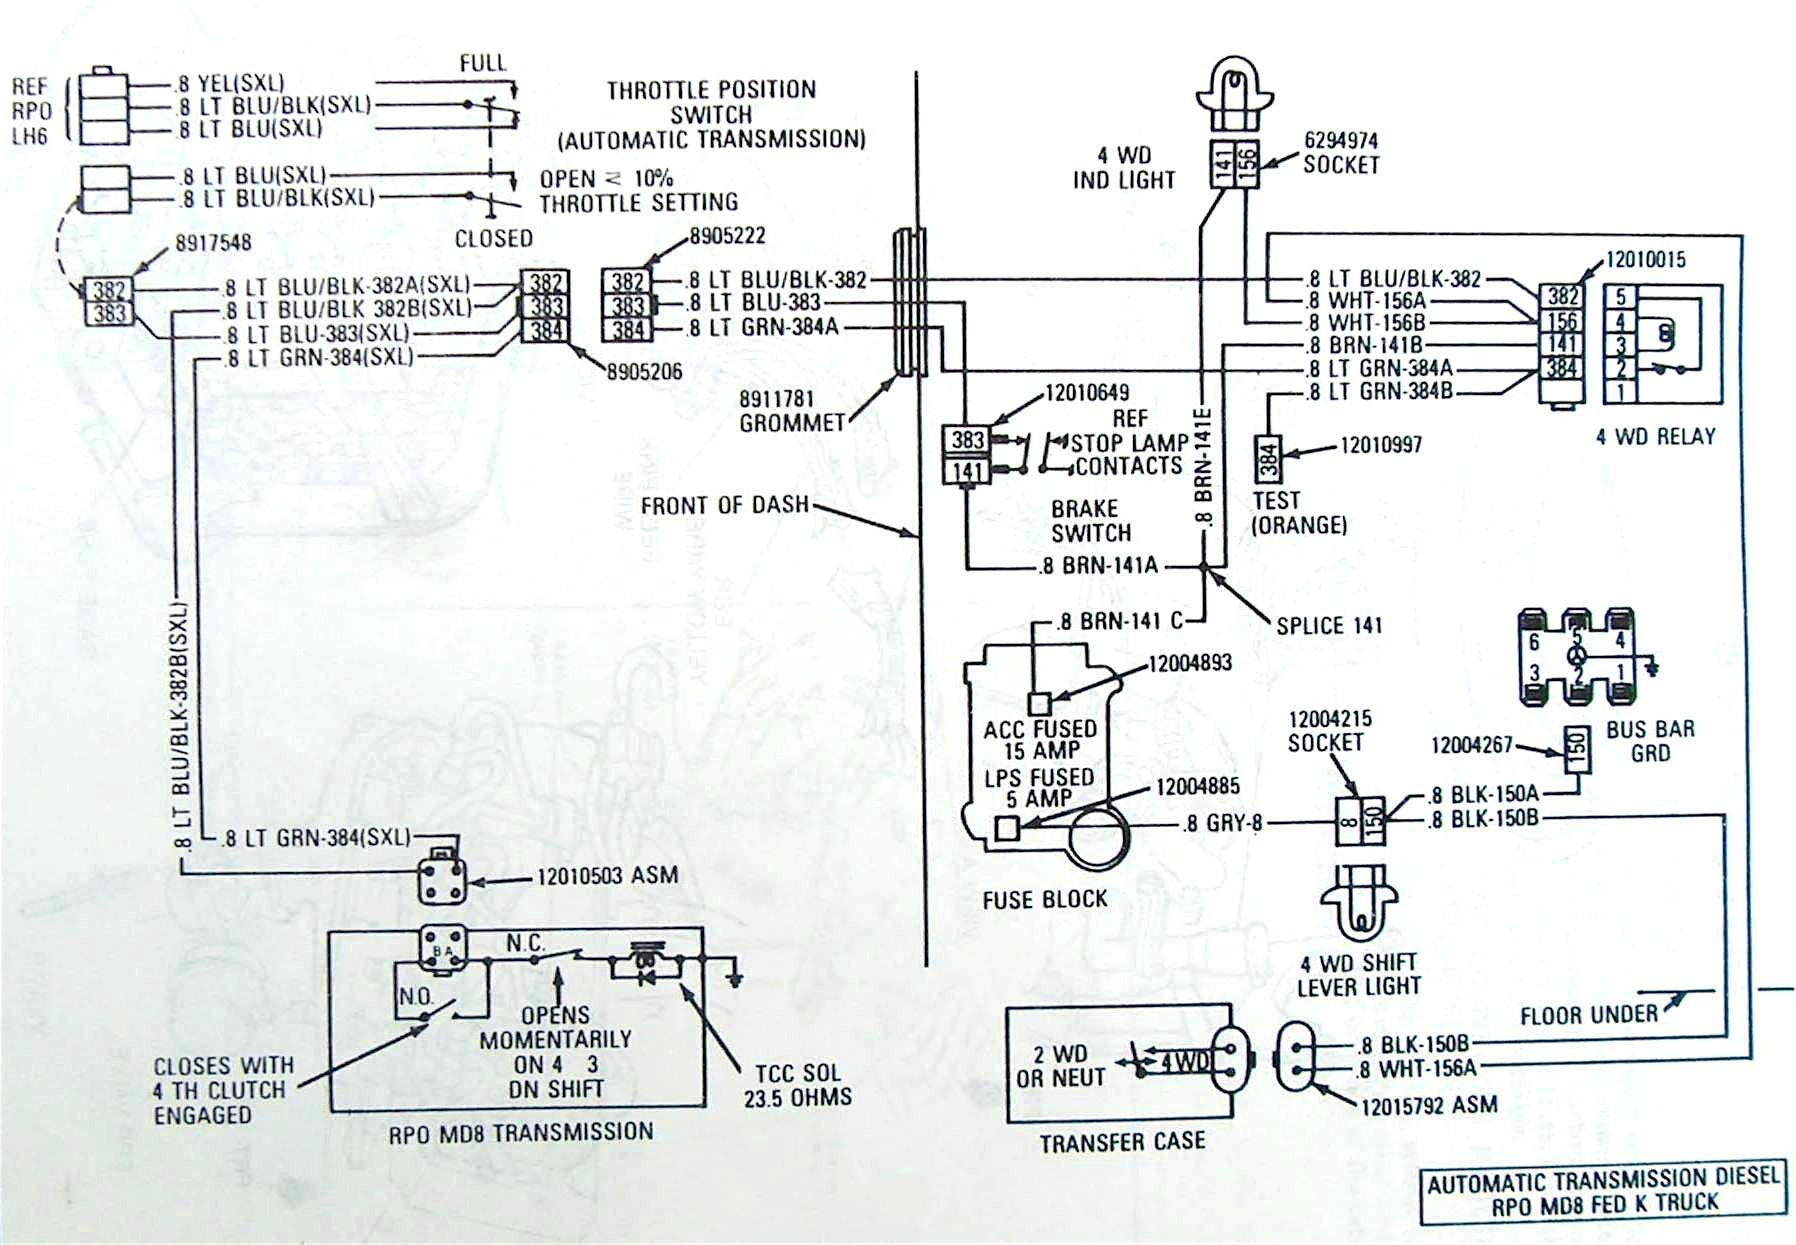 700R4 Wiring Harness | Wiring Diagram Libraries - 700R4 Wiring Diagram